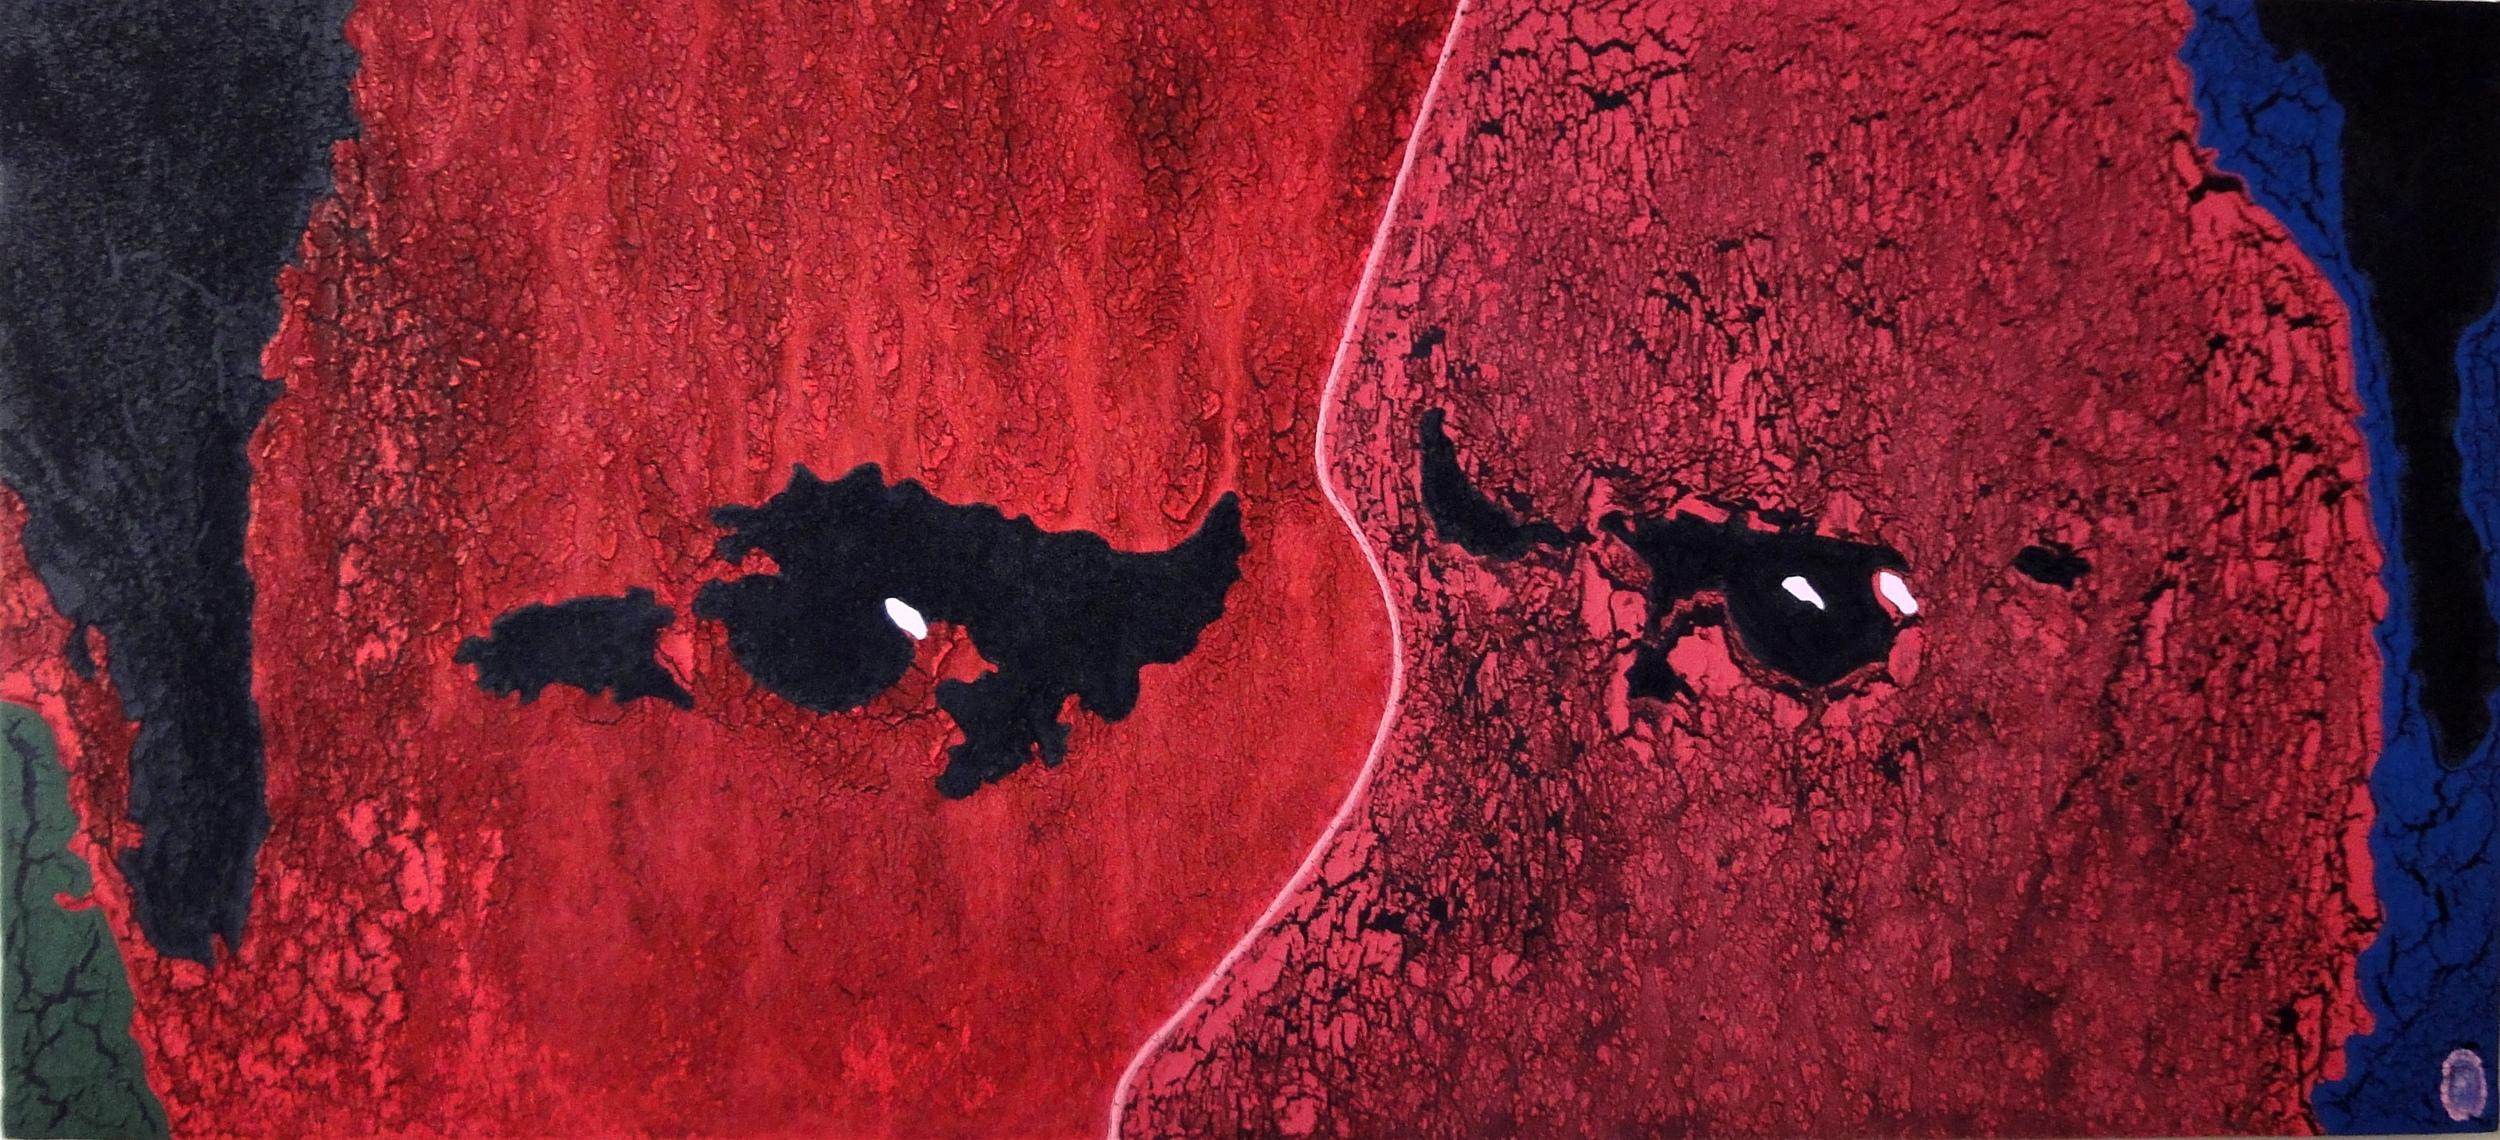 Neurosis: Split Personality (2/2)